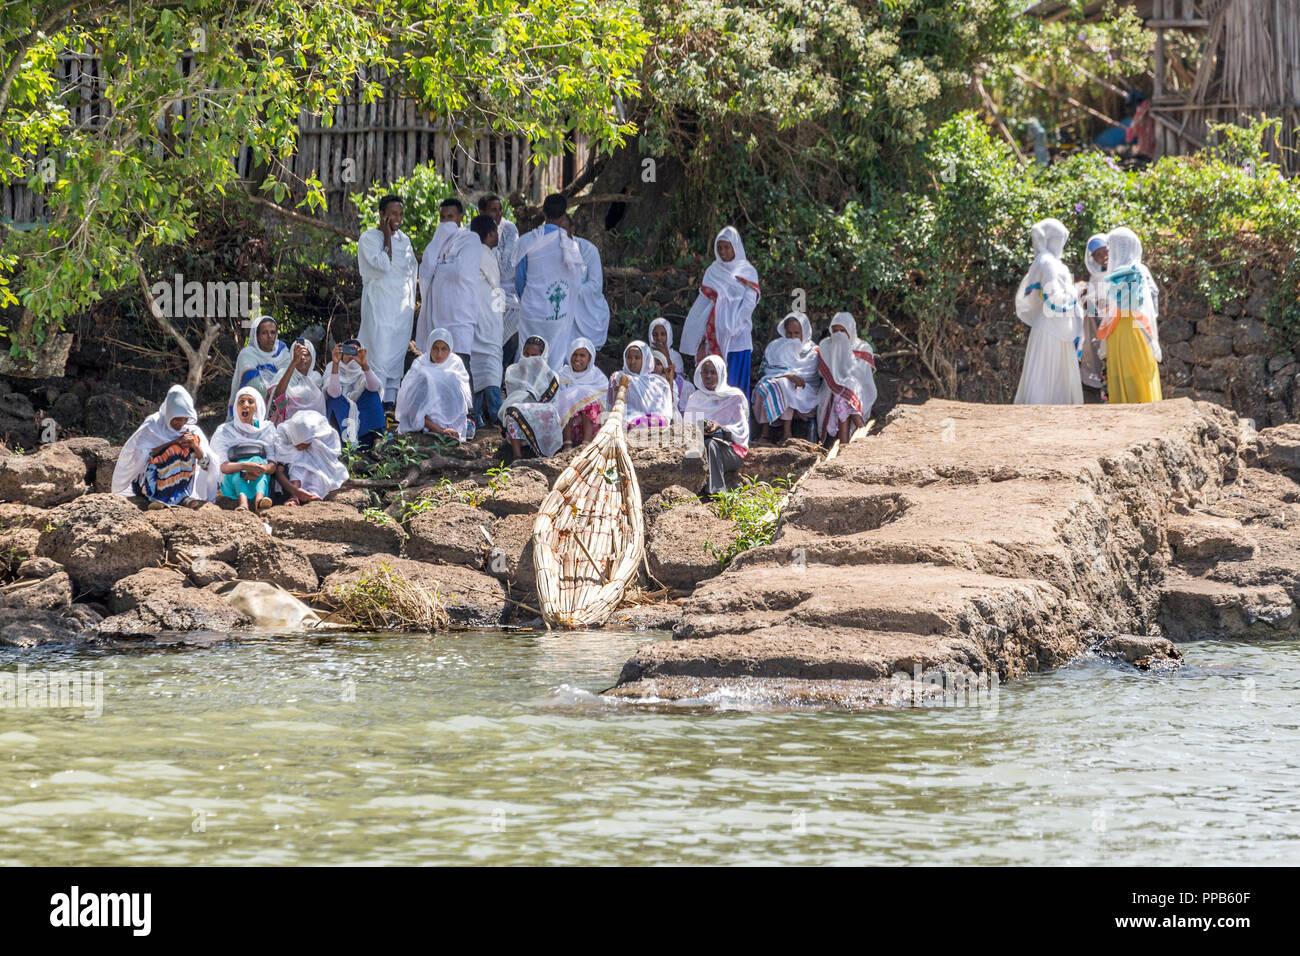 Congregants post Sunday Worship, Lake Tana where Blue Nile merges, Bahir Dar, Ethiopia - Stock Image